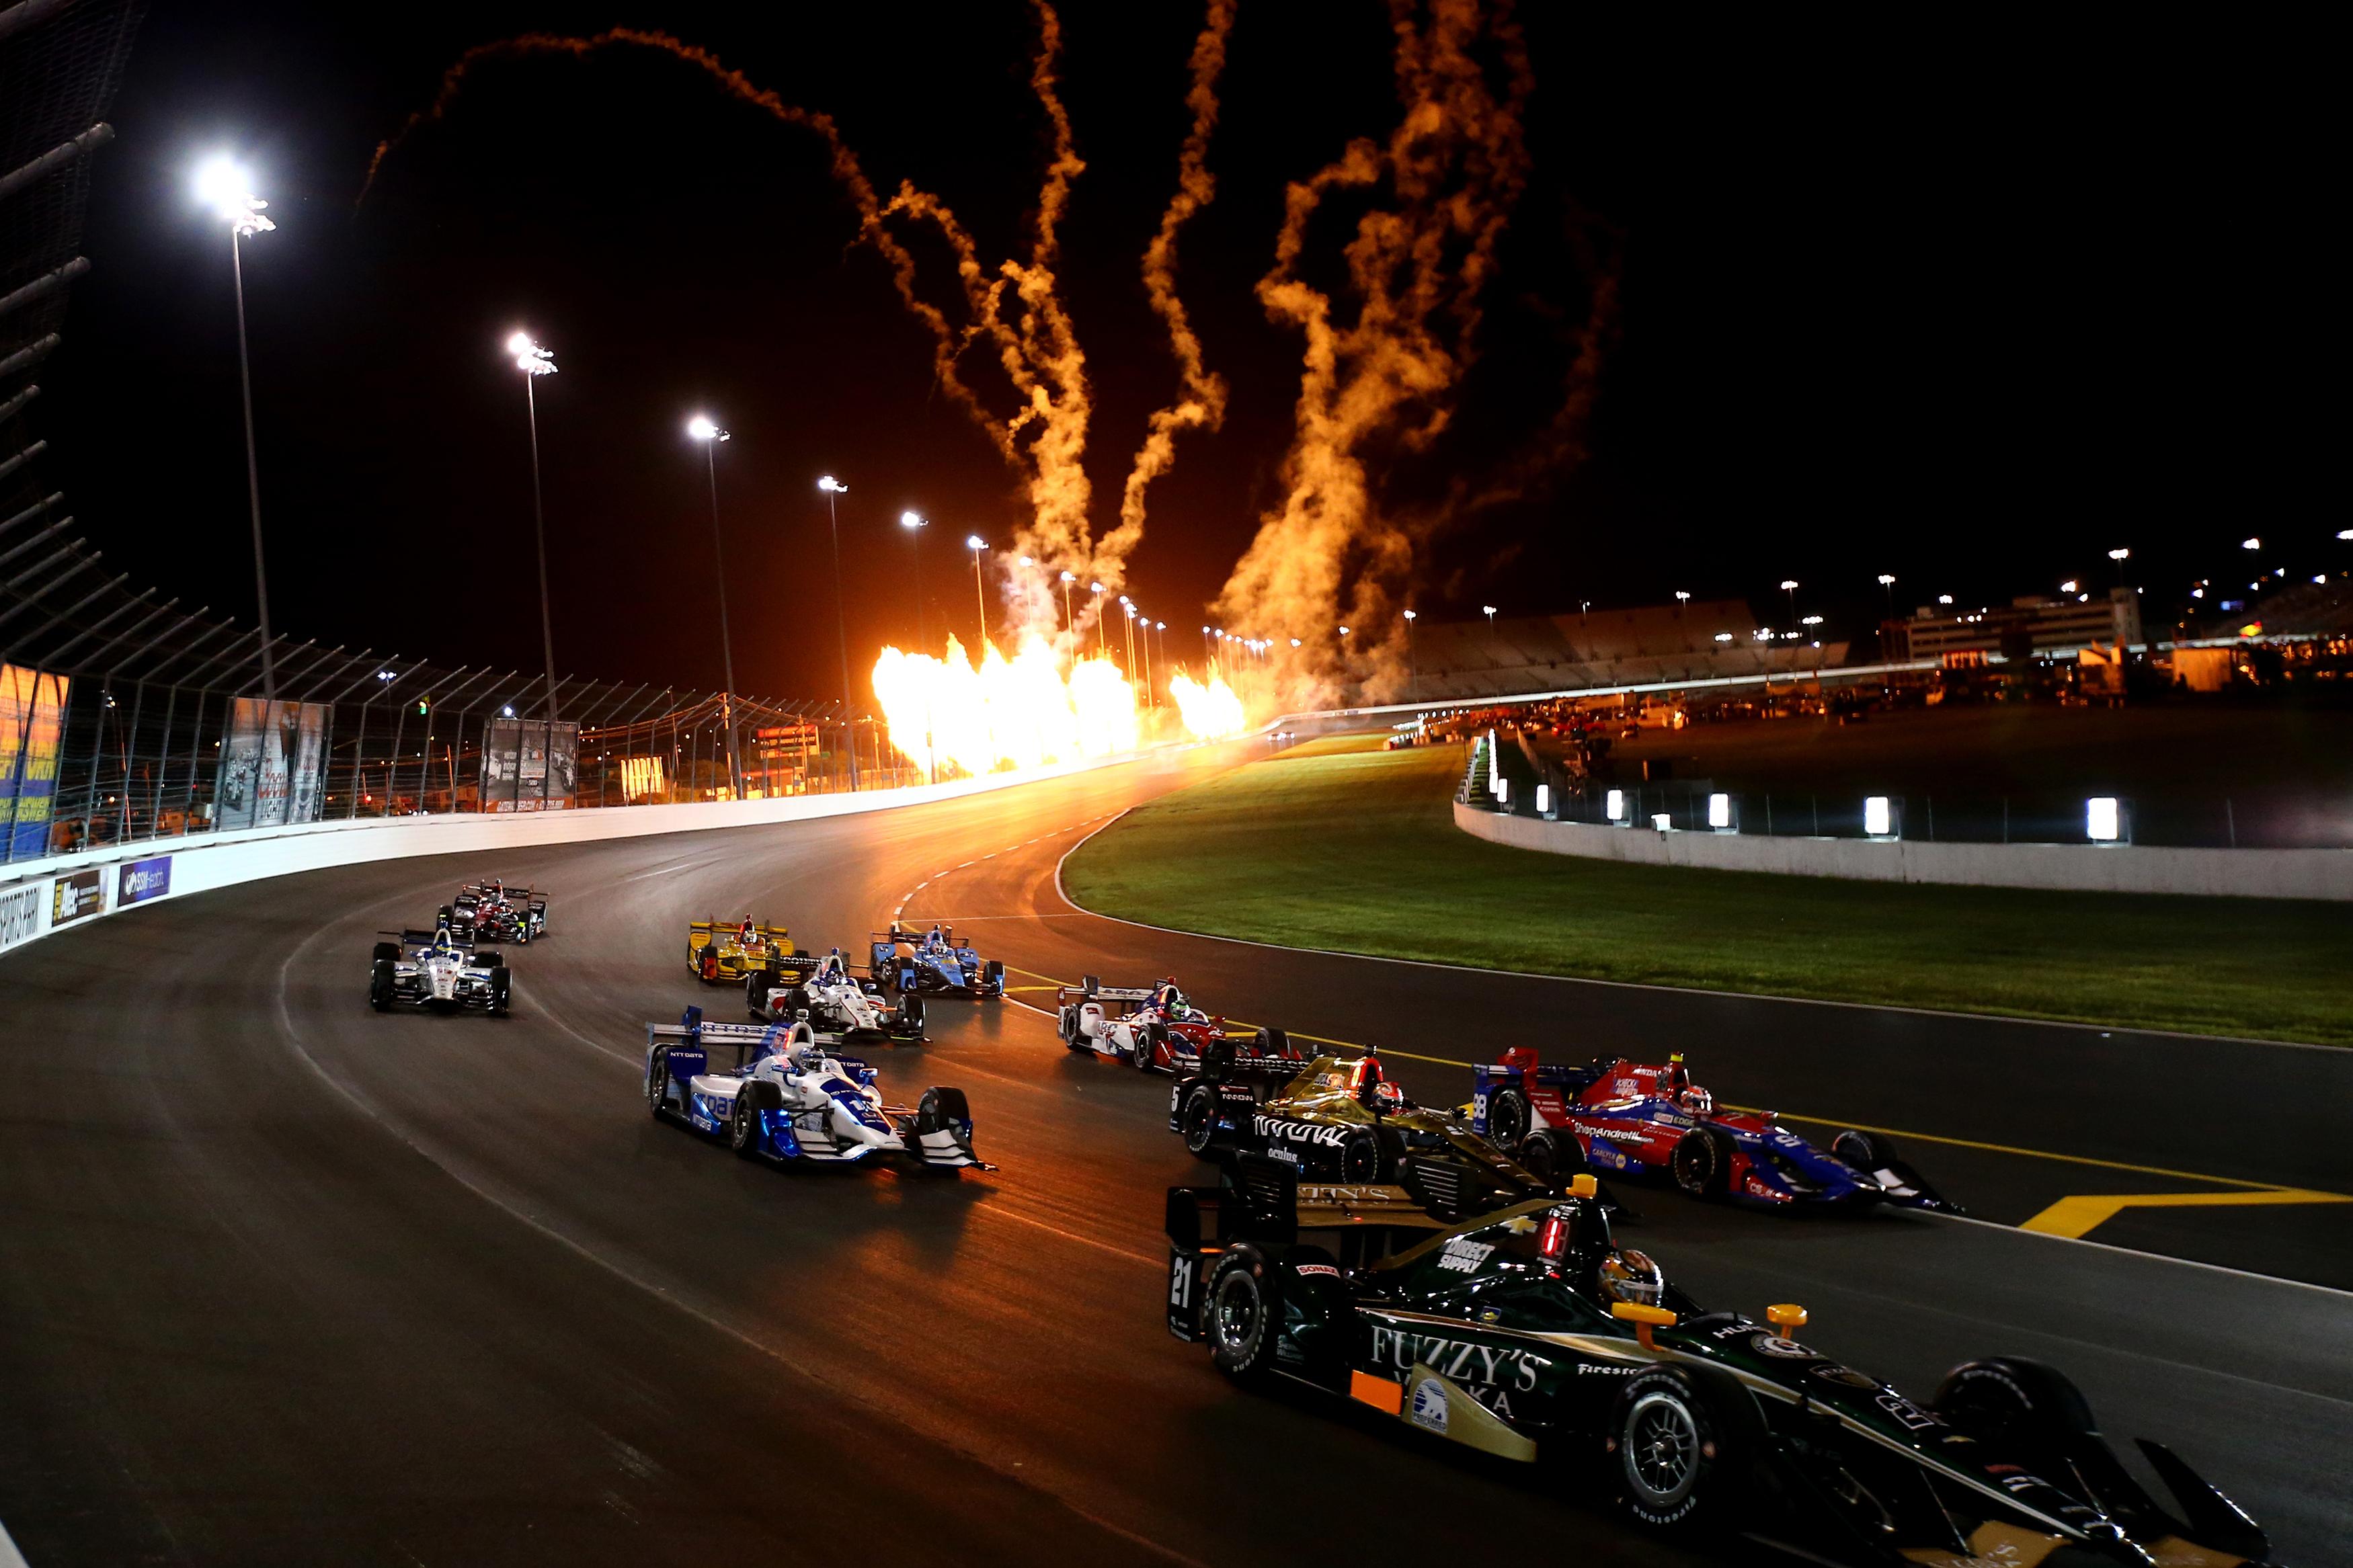 Indycar 3 wide salute - Gateway Motorsports Park